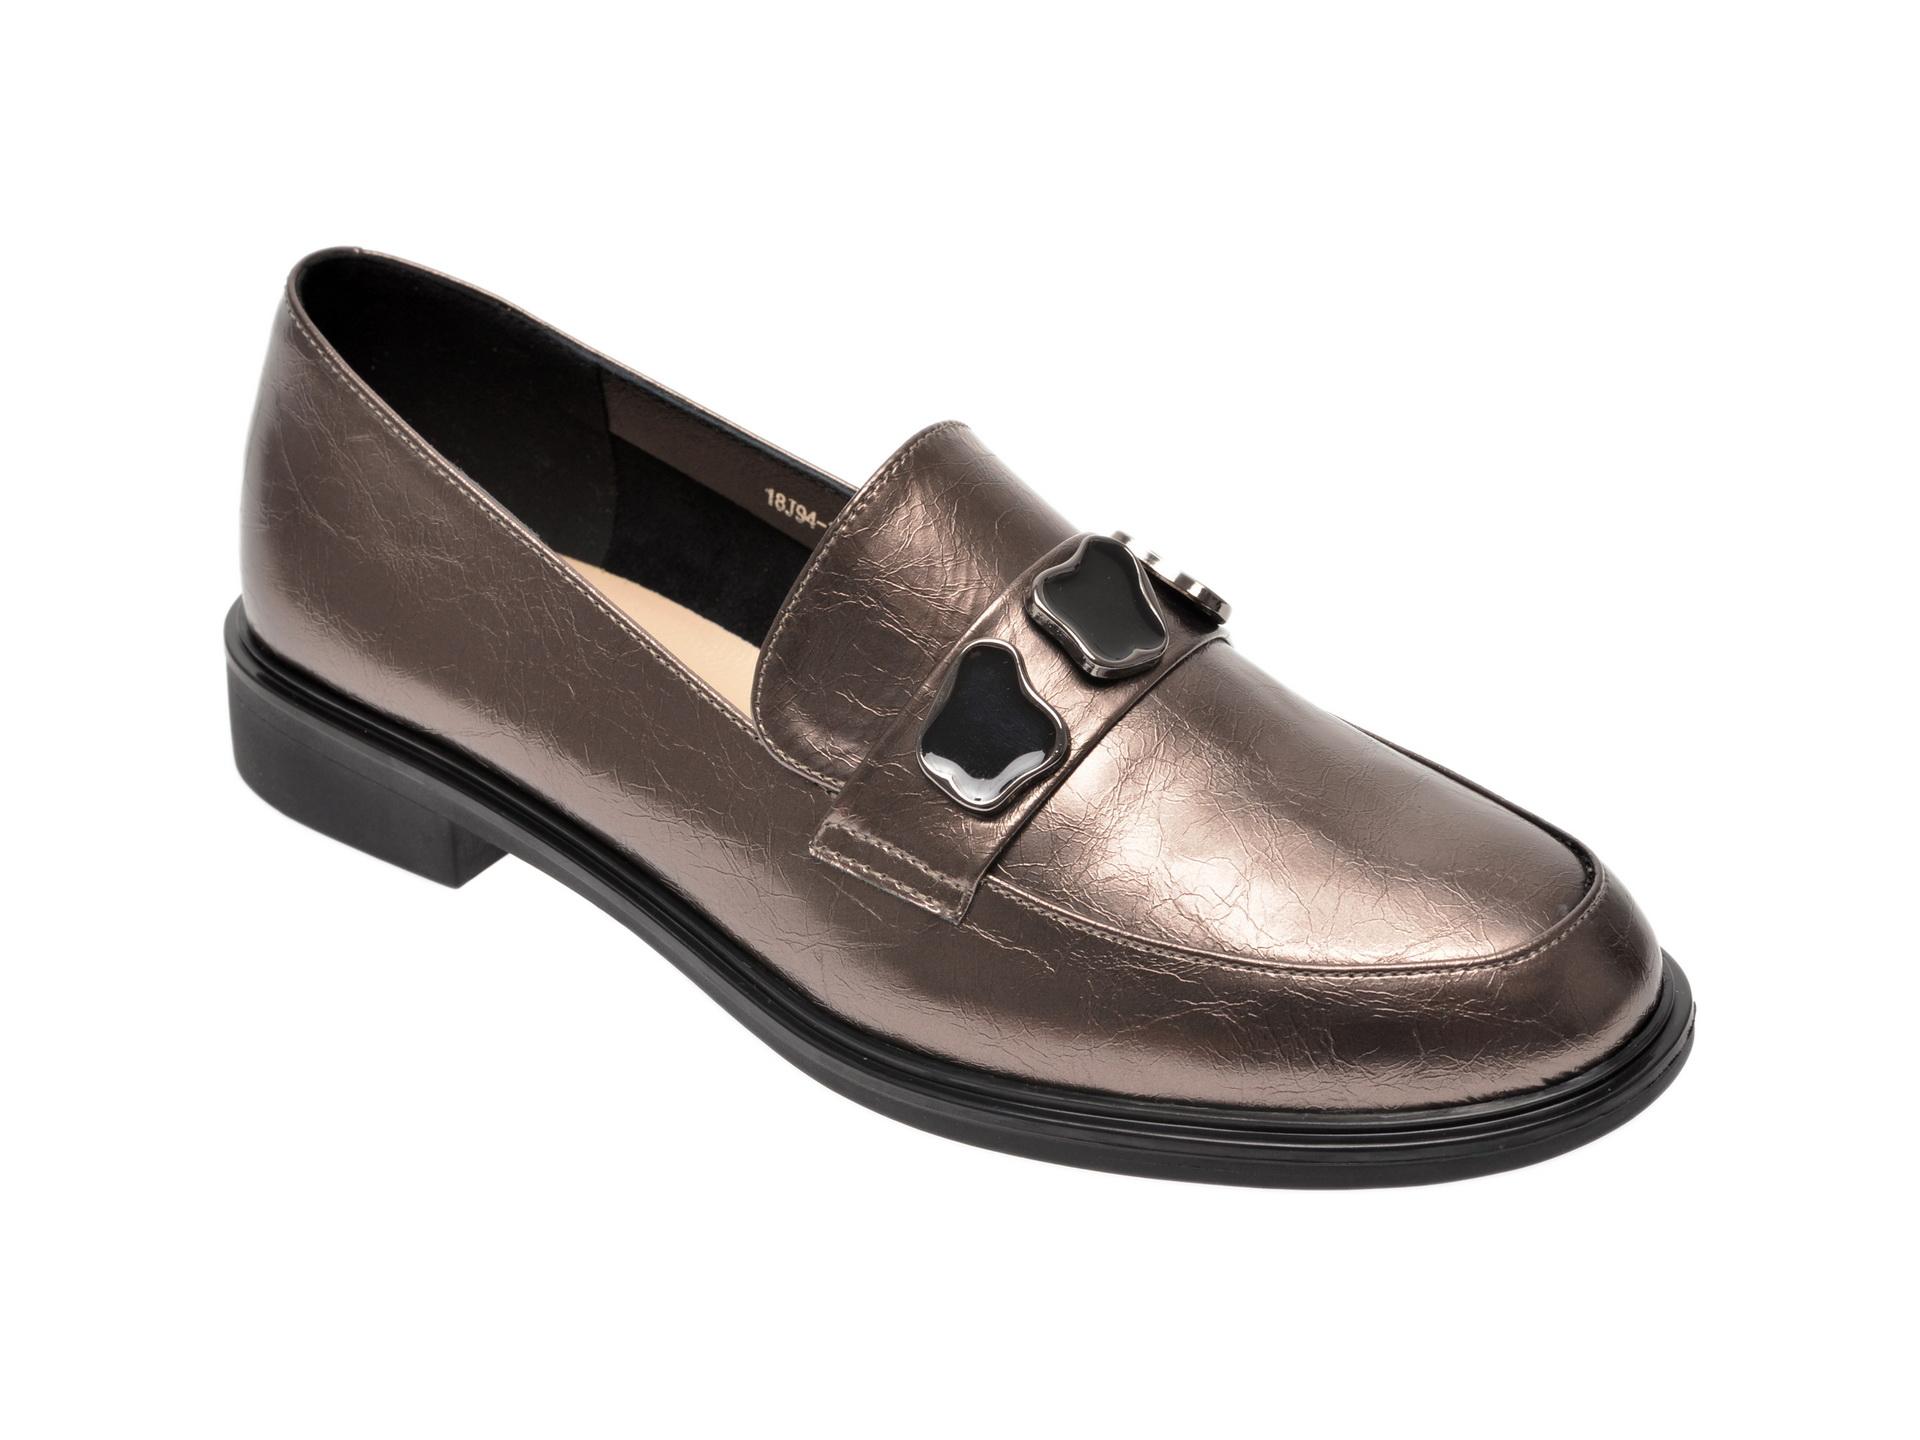 Pantofi EPICA gri, 18J9433, din piele naturala imagine